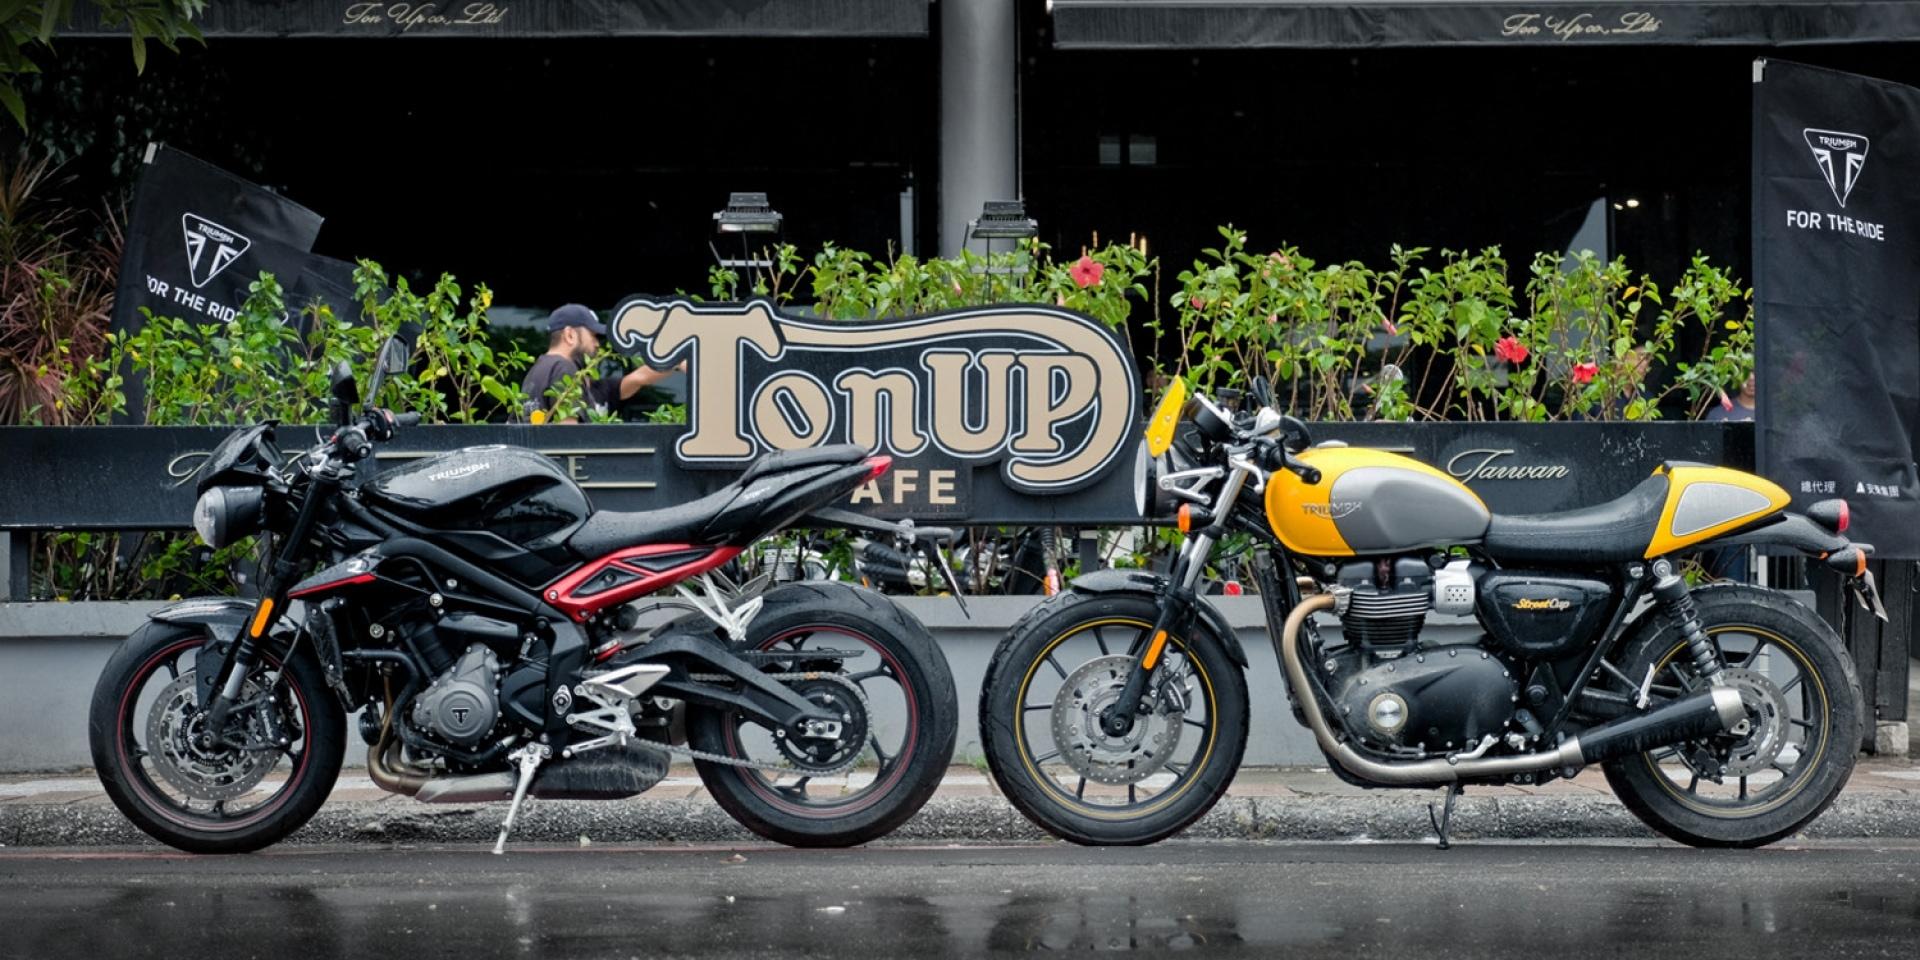 2017  TRIUMPH 三缸猛獸Street Triple R,復古咖啡Street Cup新車發表